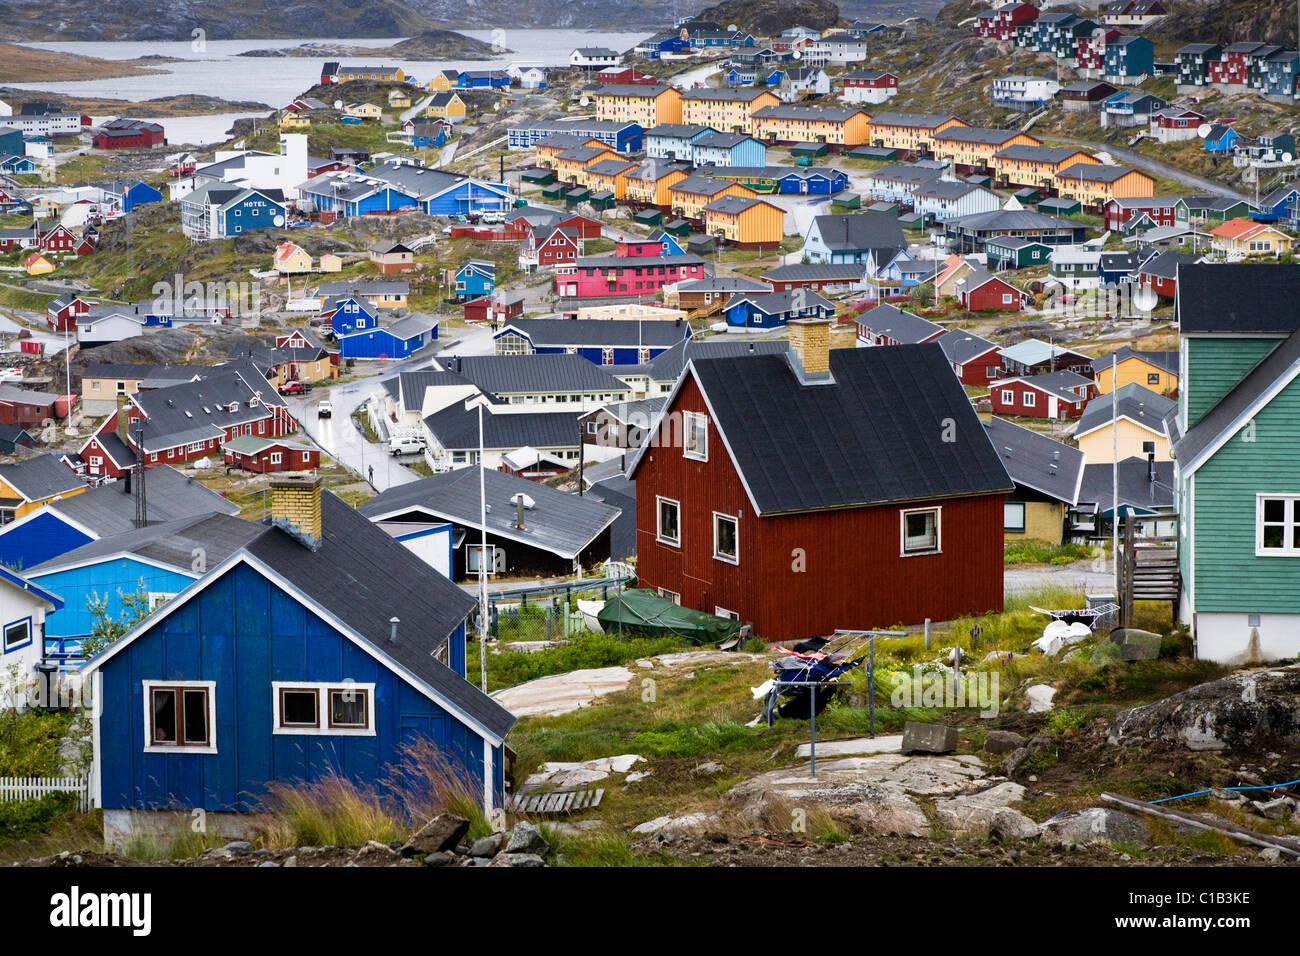 Qaqortoq (Julianehåb), South Greenland - Stock Image